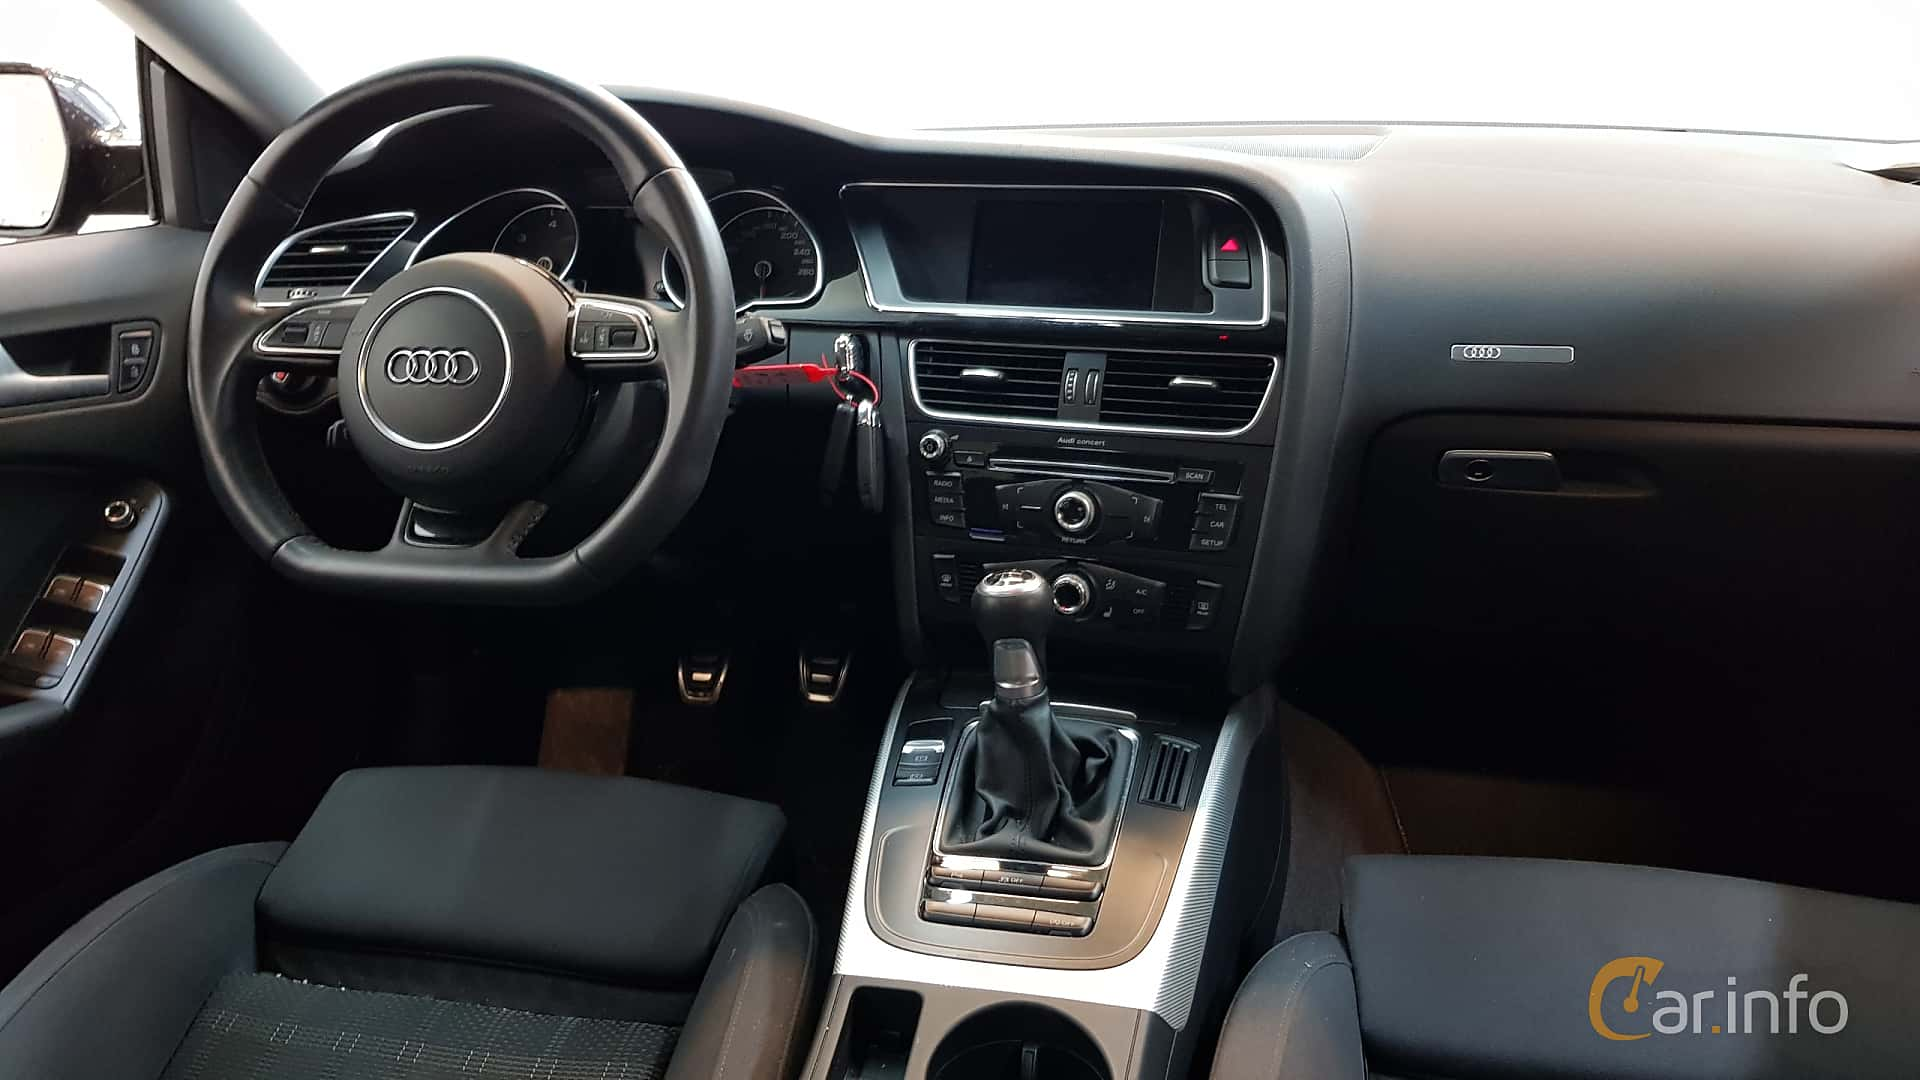 Audi A5 Sportback 2.0 TDI clean diesel Manual, 190hp, 2015